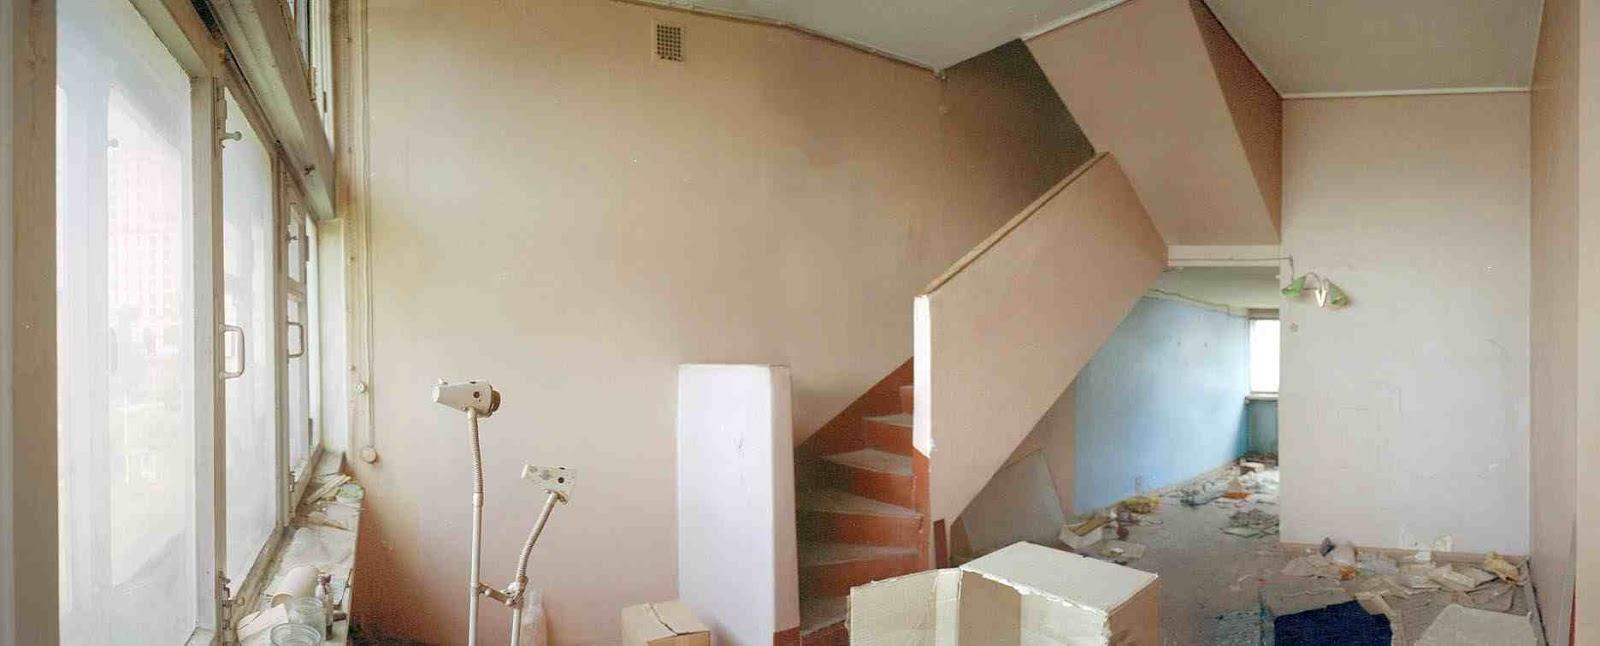 an apartment pre 'restoration'/ 'remont' photograph by Richard Pare